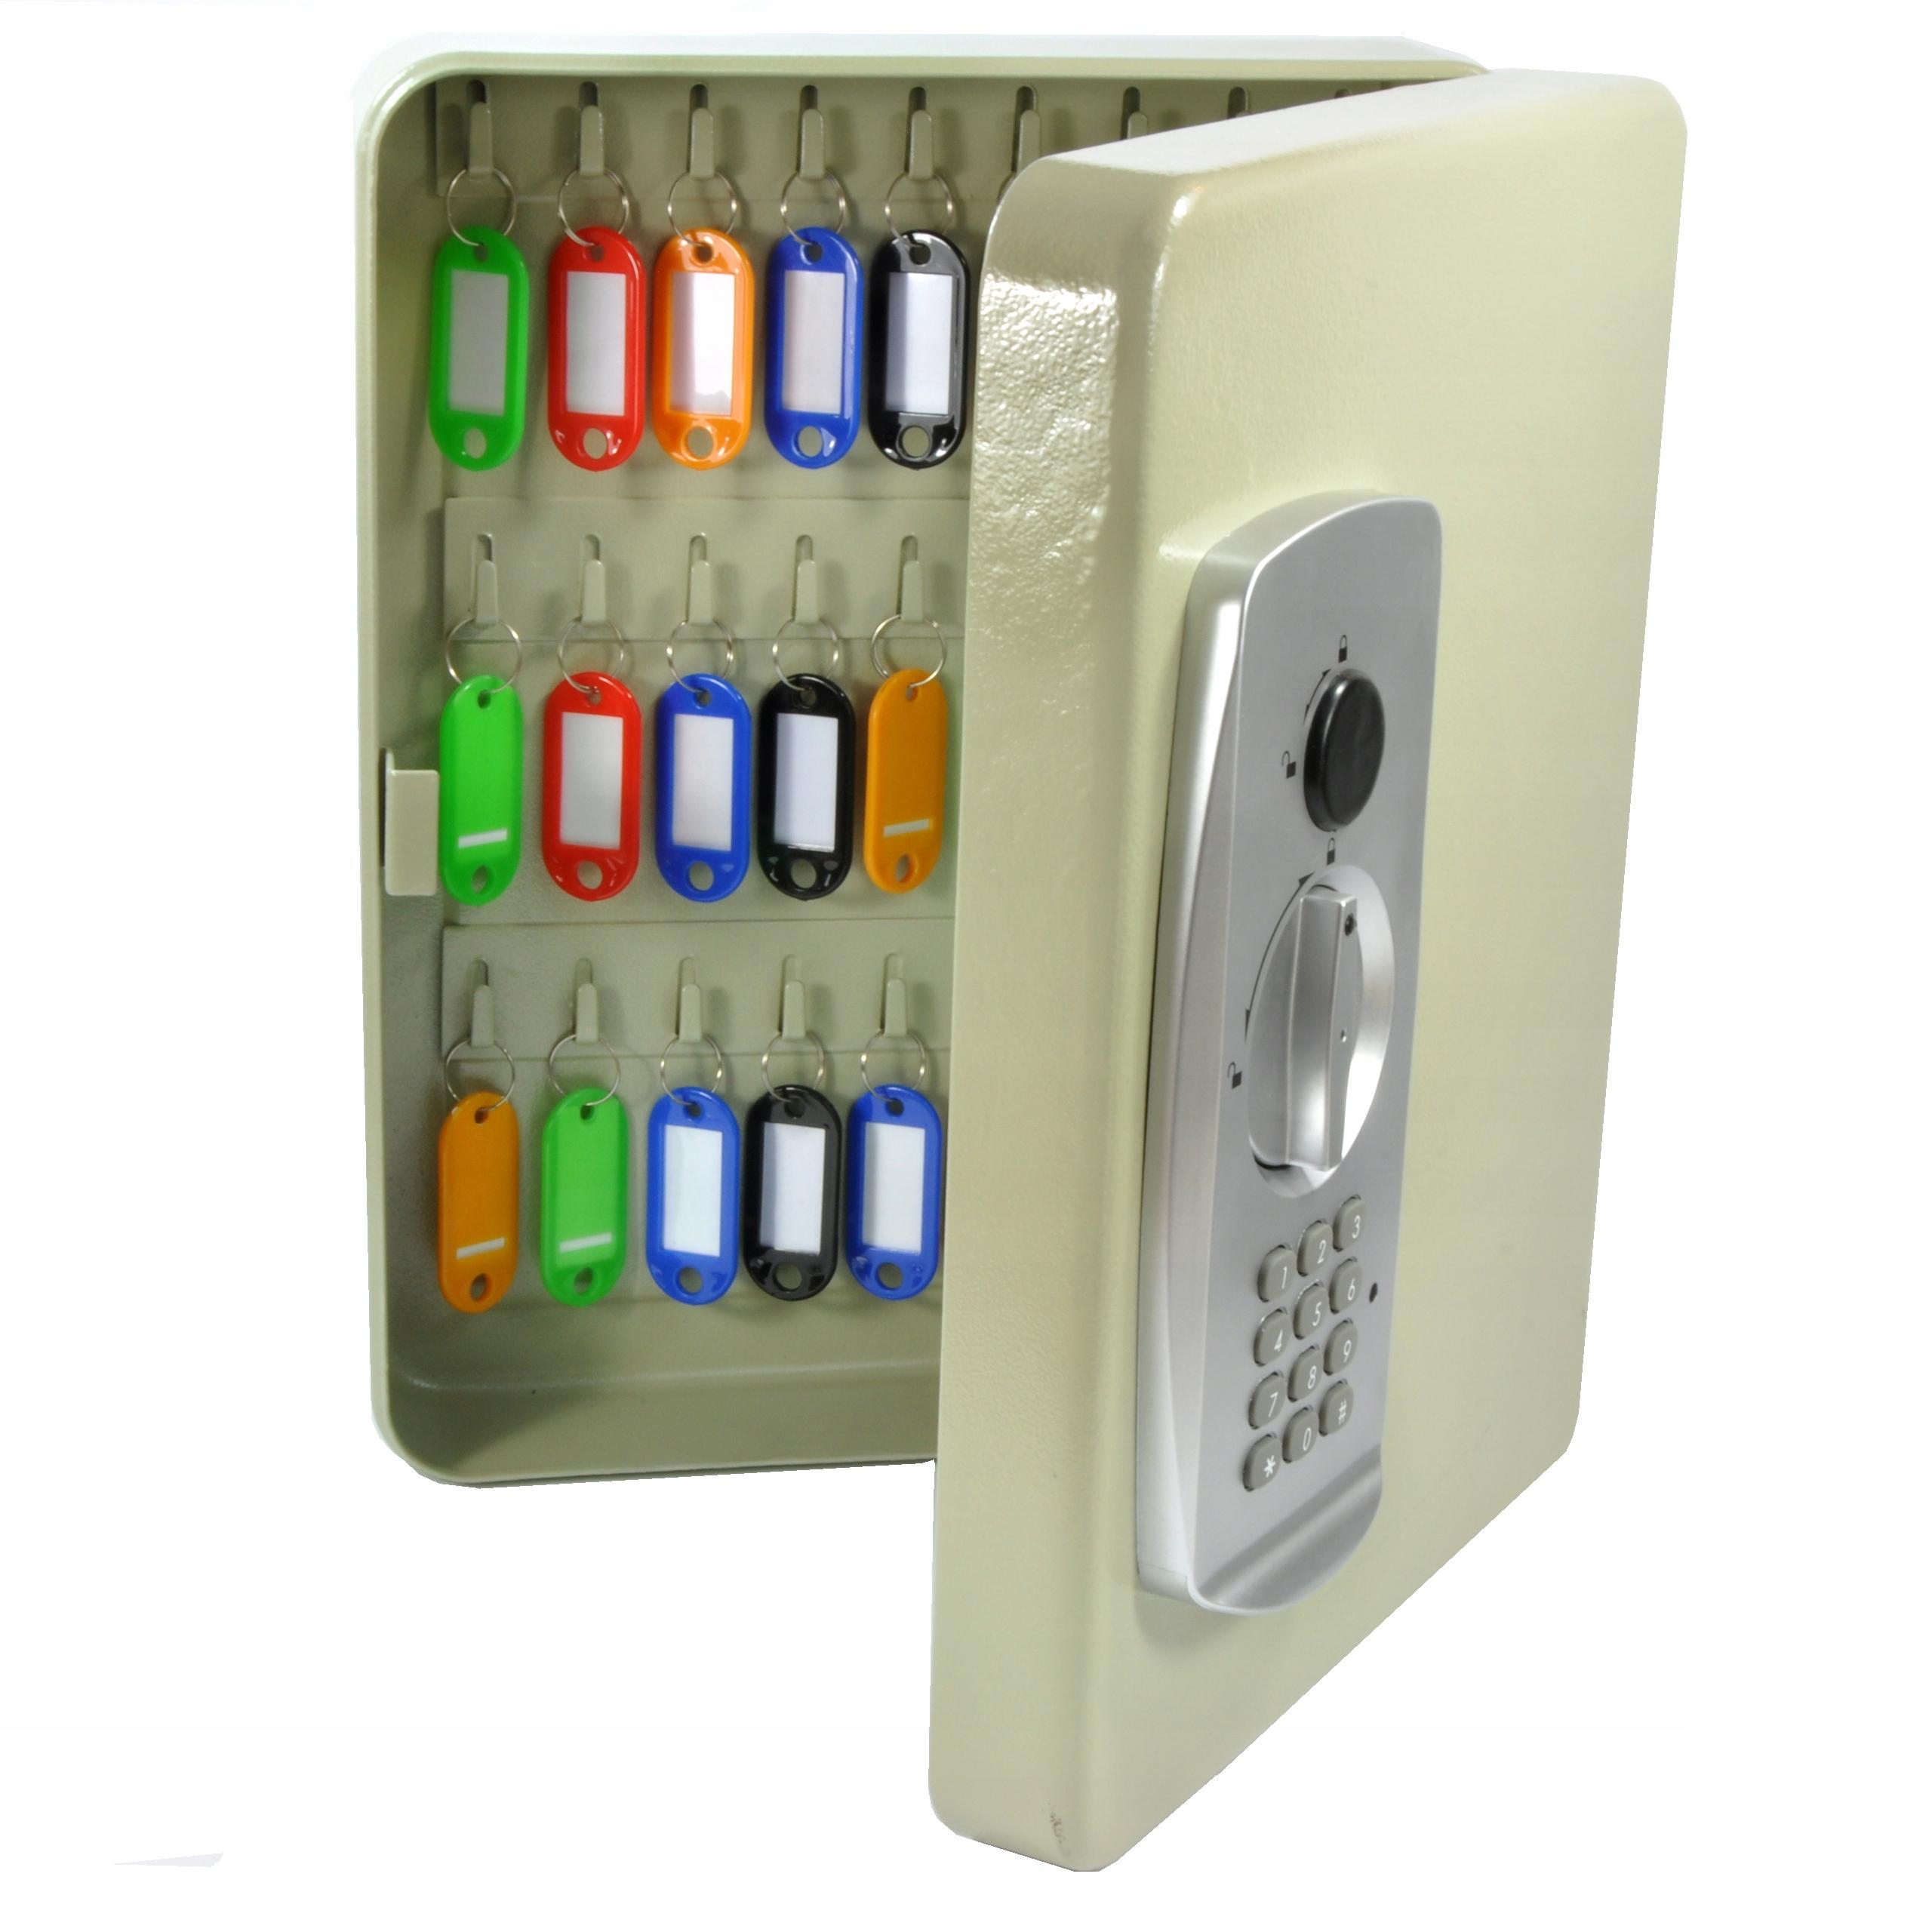 ящик шкатулка на ключи 27 штук замок цифровой